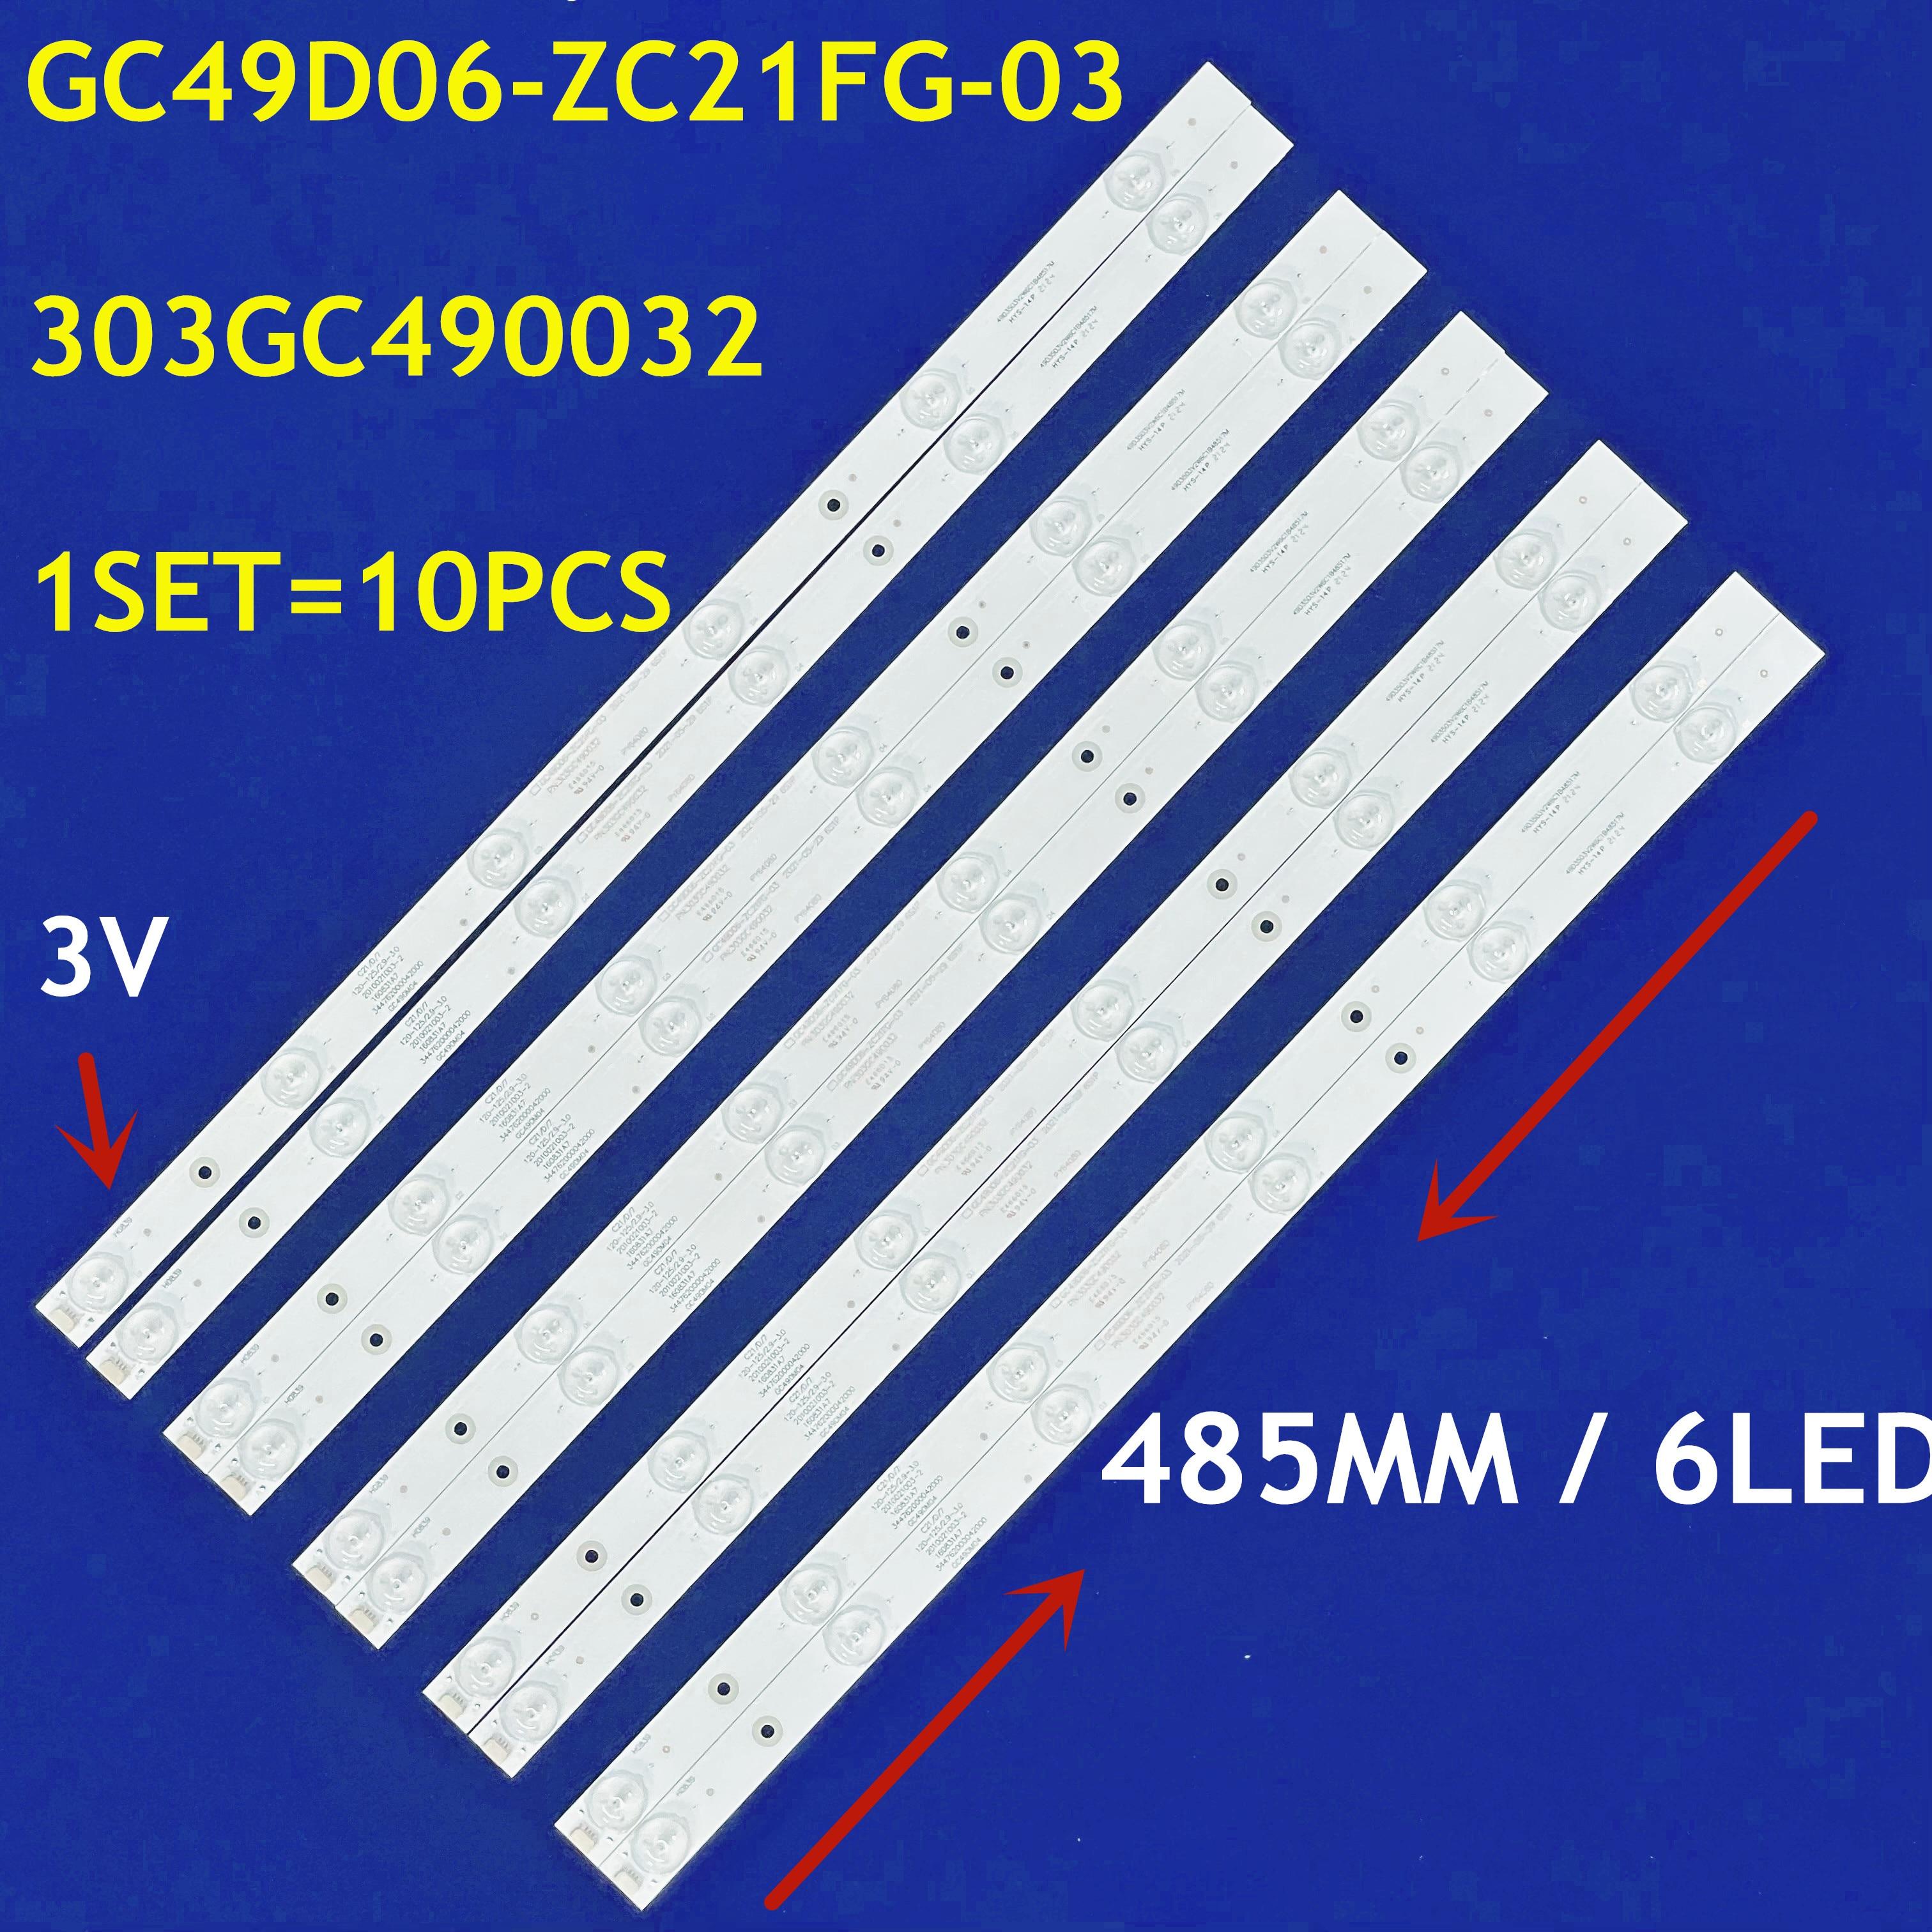 جديد 485 مللي متر 1 مجموعة = 10 قطعة LED شريط إضاءة خلفي 6LED GC49D06-ZC21FG-03 303GC490032 ل H49E12